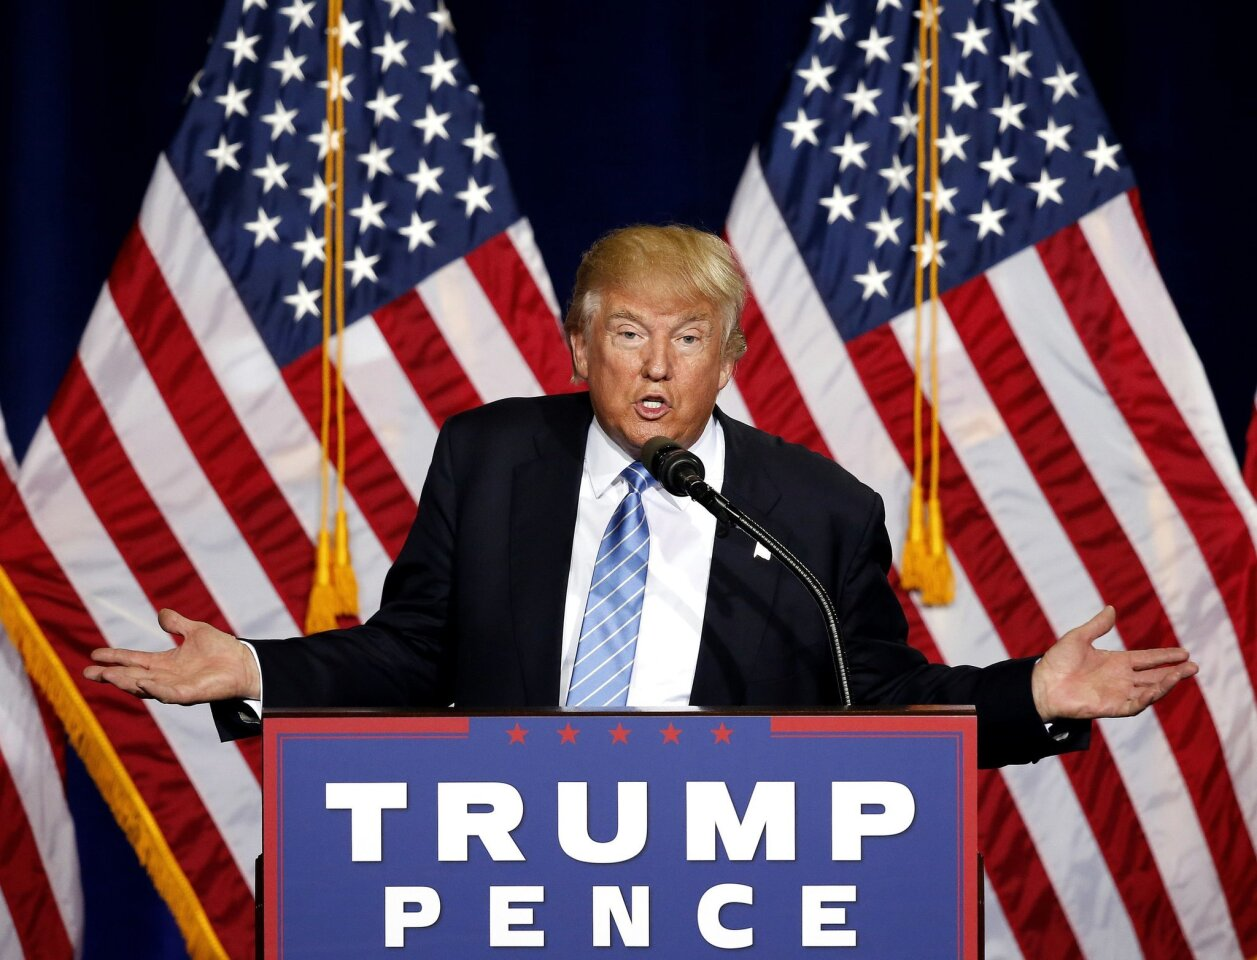 Donald Trump's immigration speech